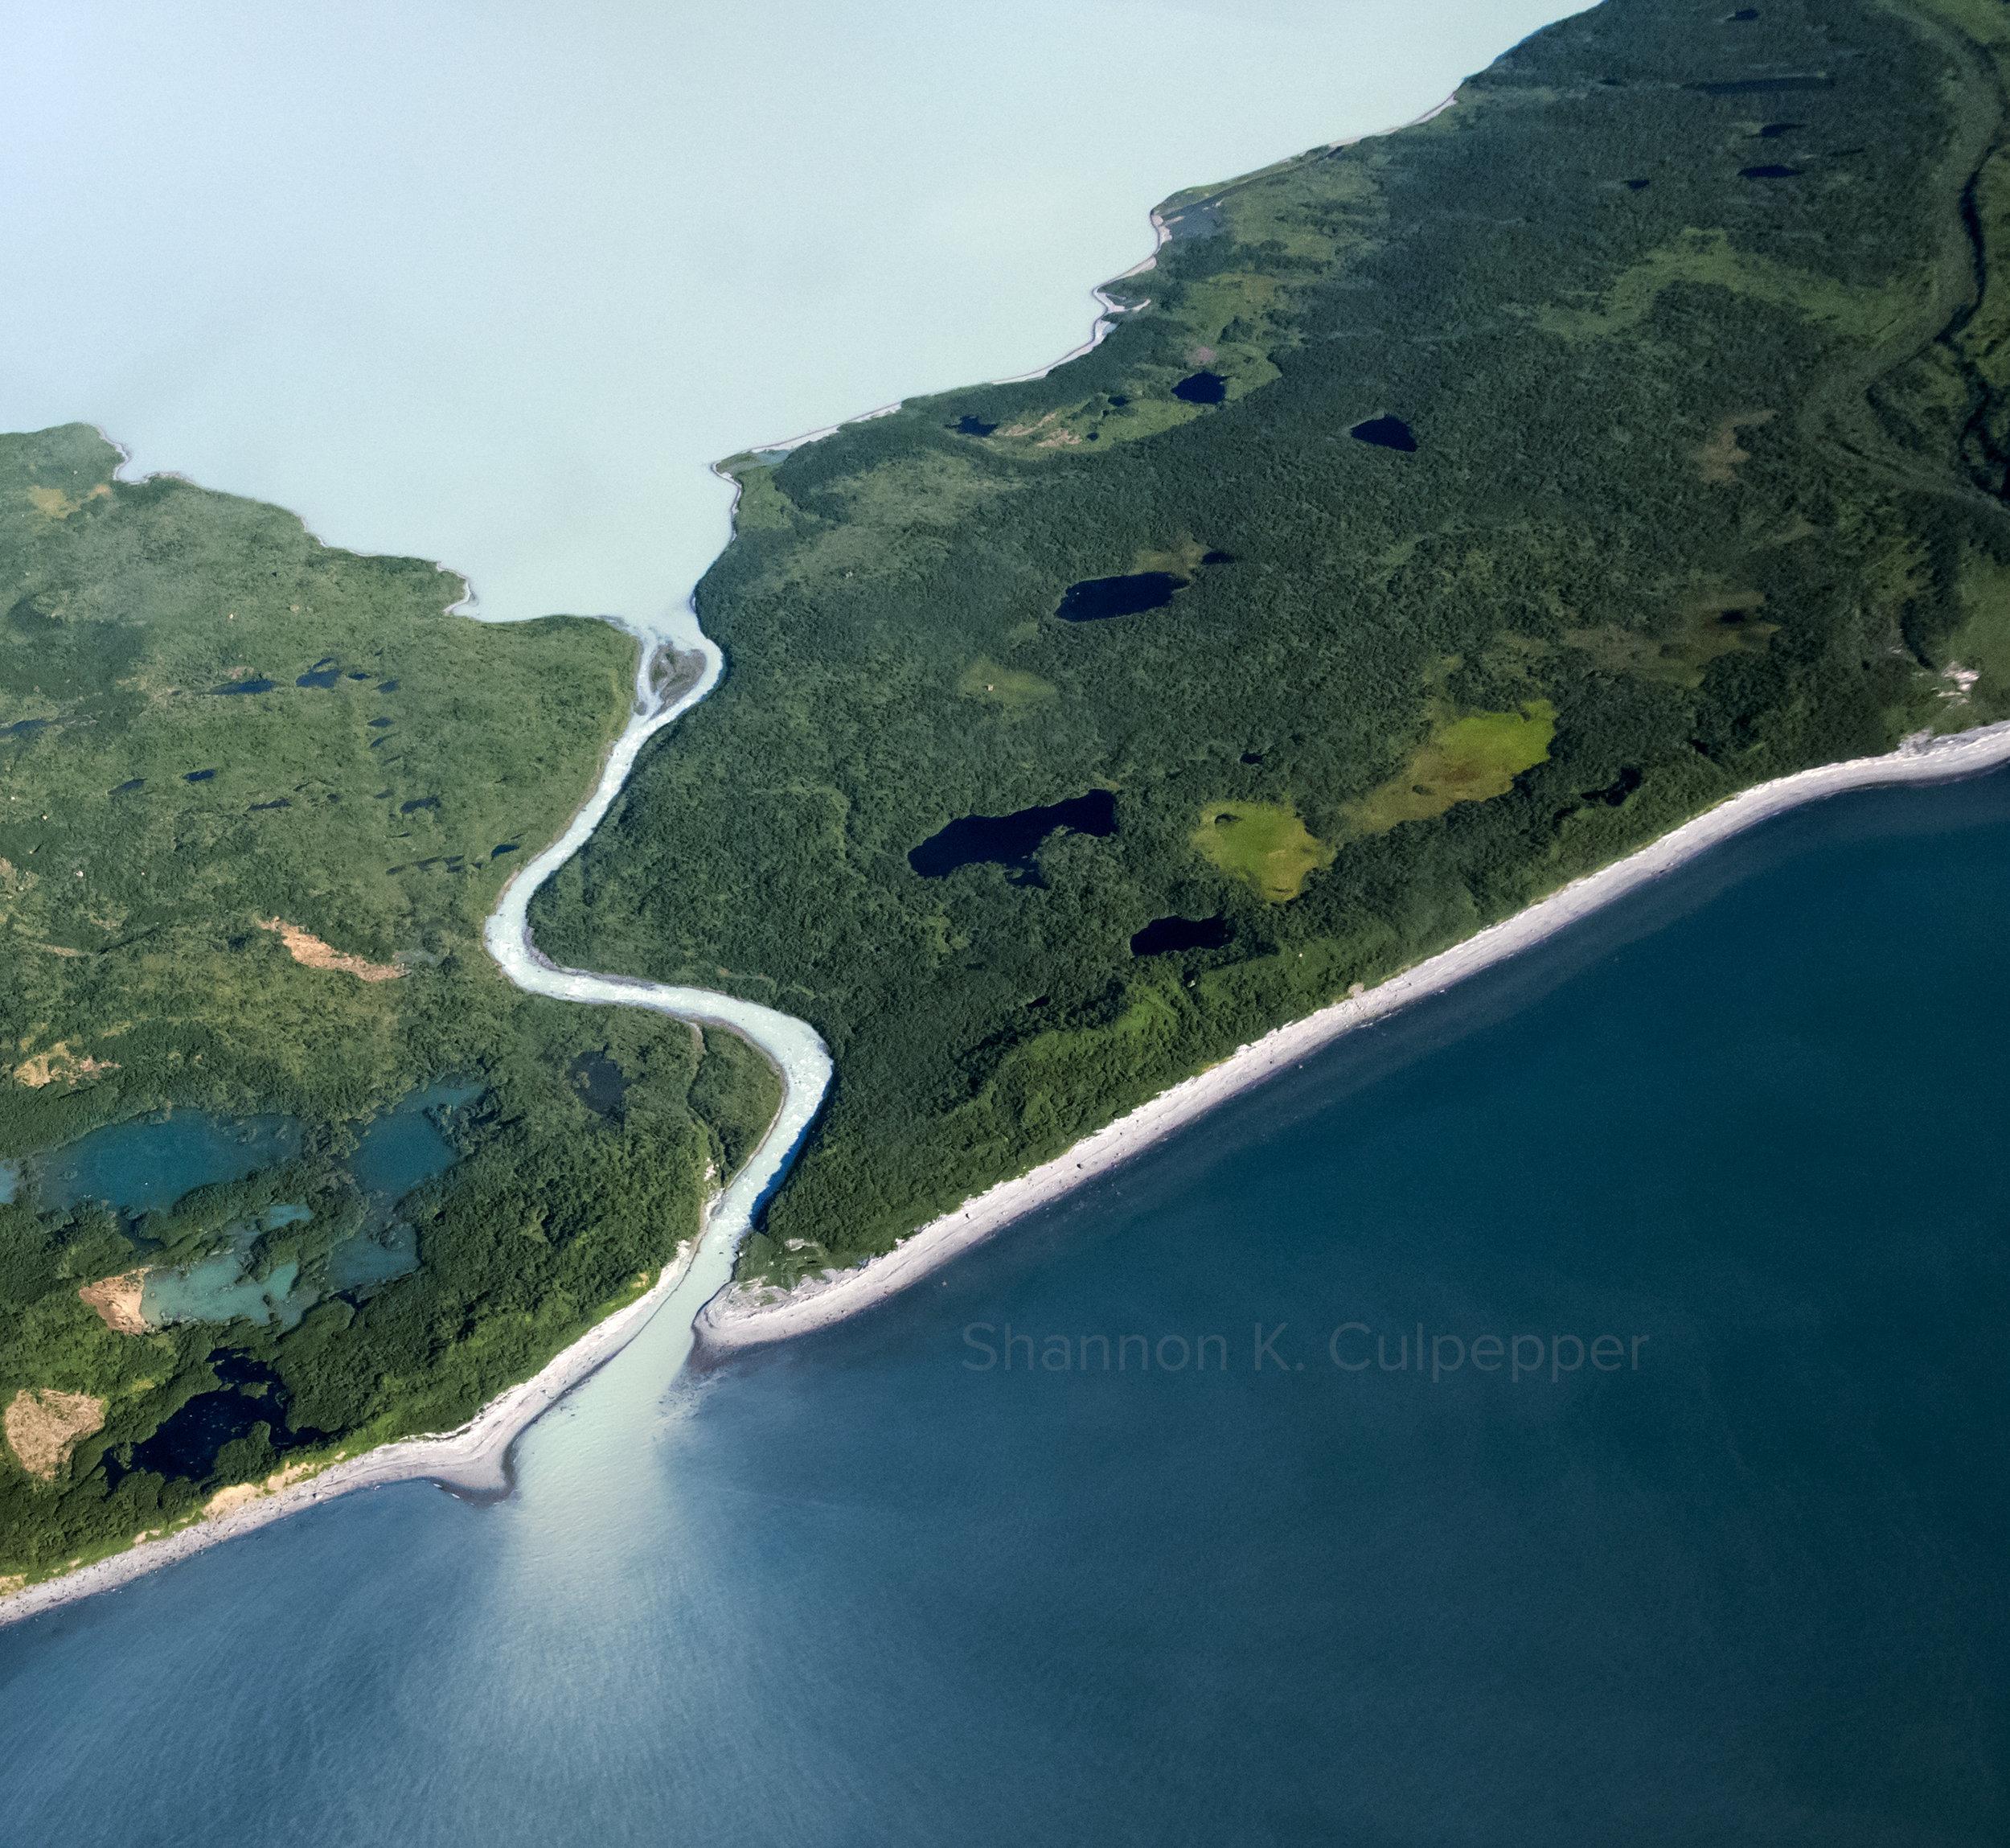 glacier_lake_alaska_shannon.jpg